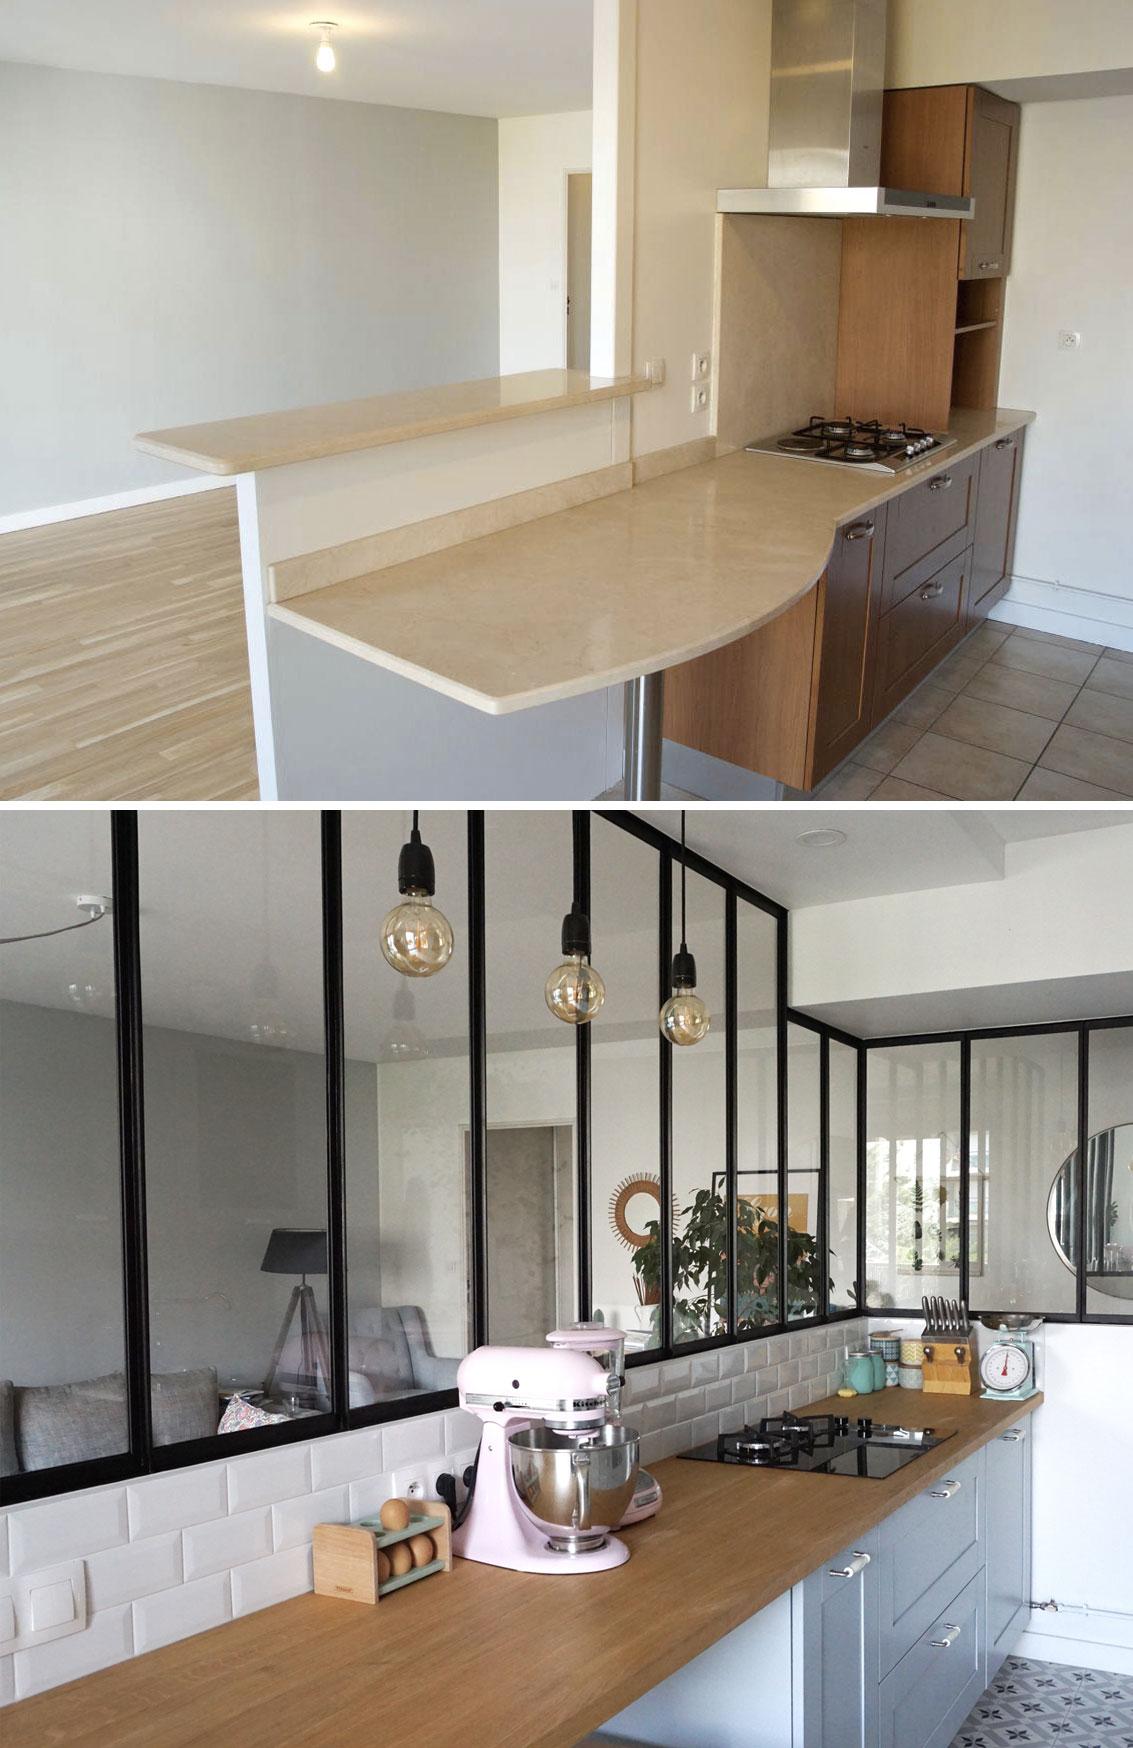 relooking cuisine ma cuisine avant apr s r novation. Black Bedroom Furniture Sets. Home Design Ideas